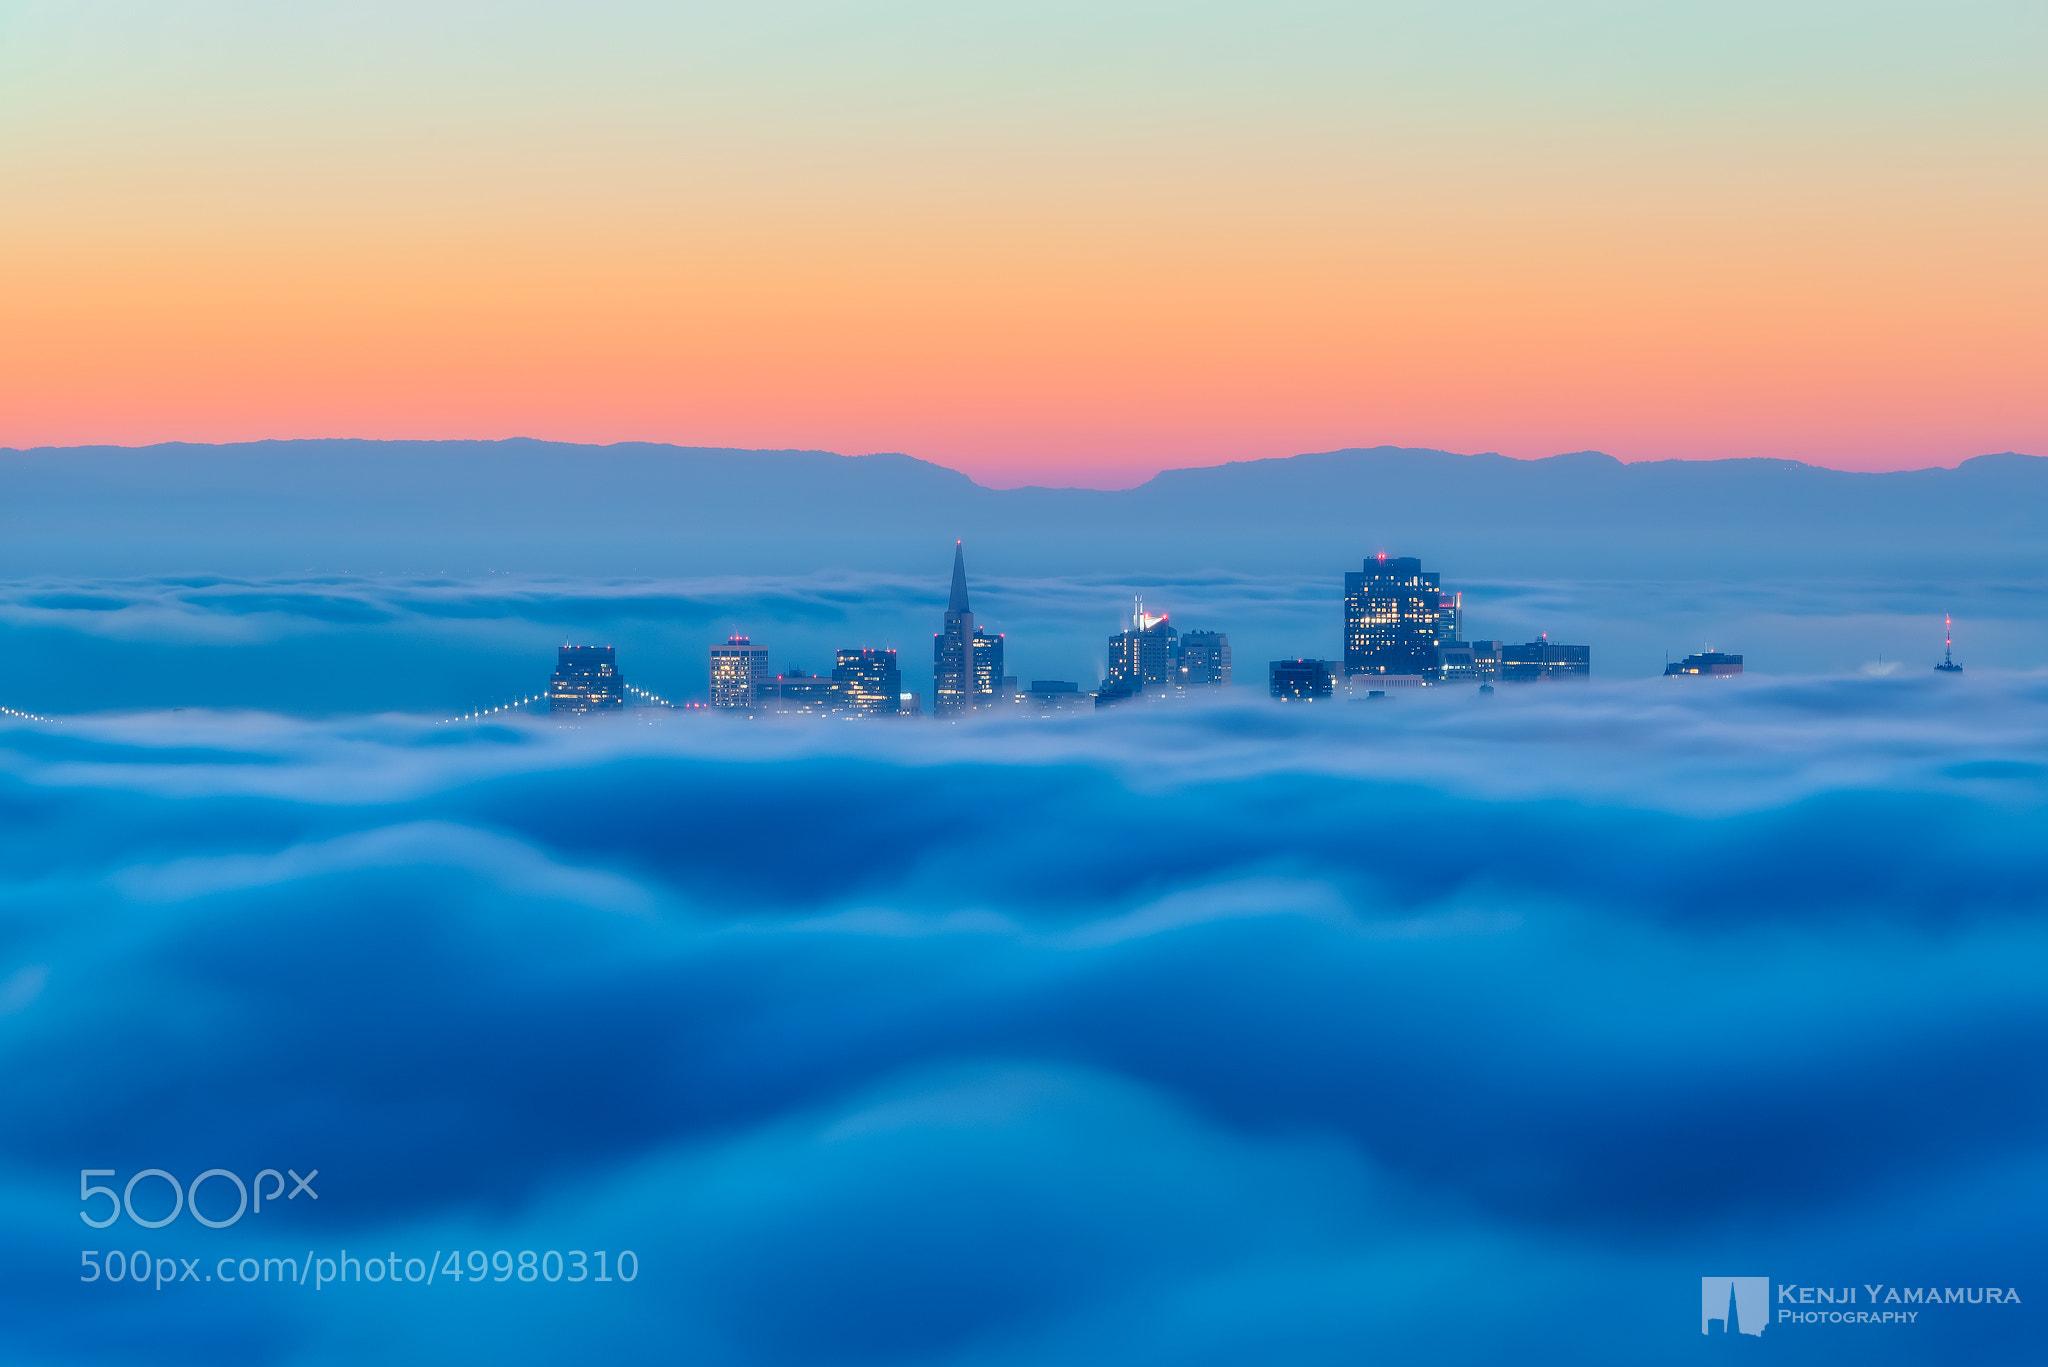 Photograph Floating City by Kenji Yamamura on 500px